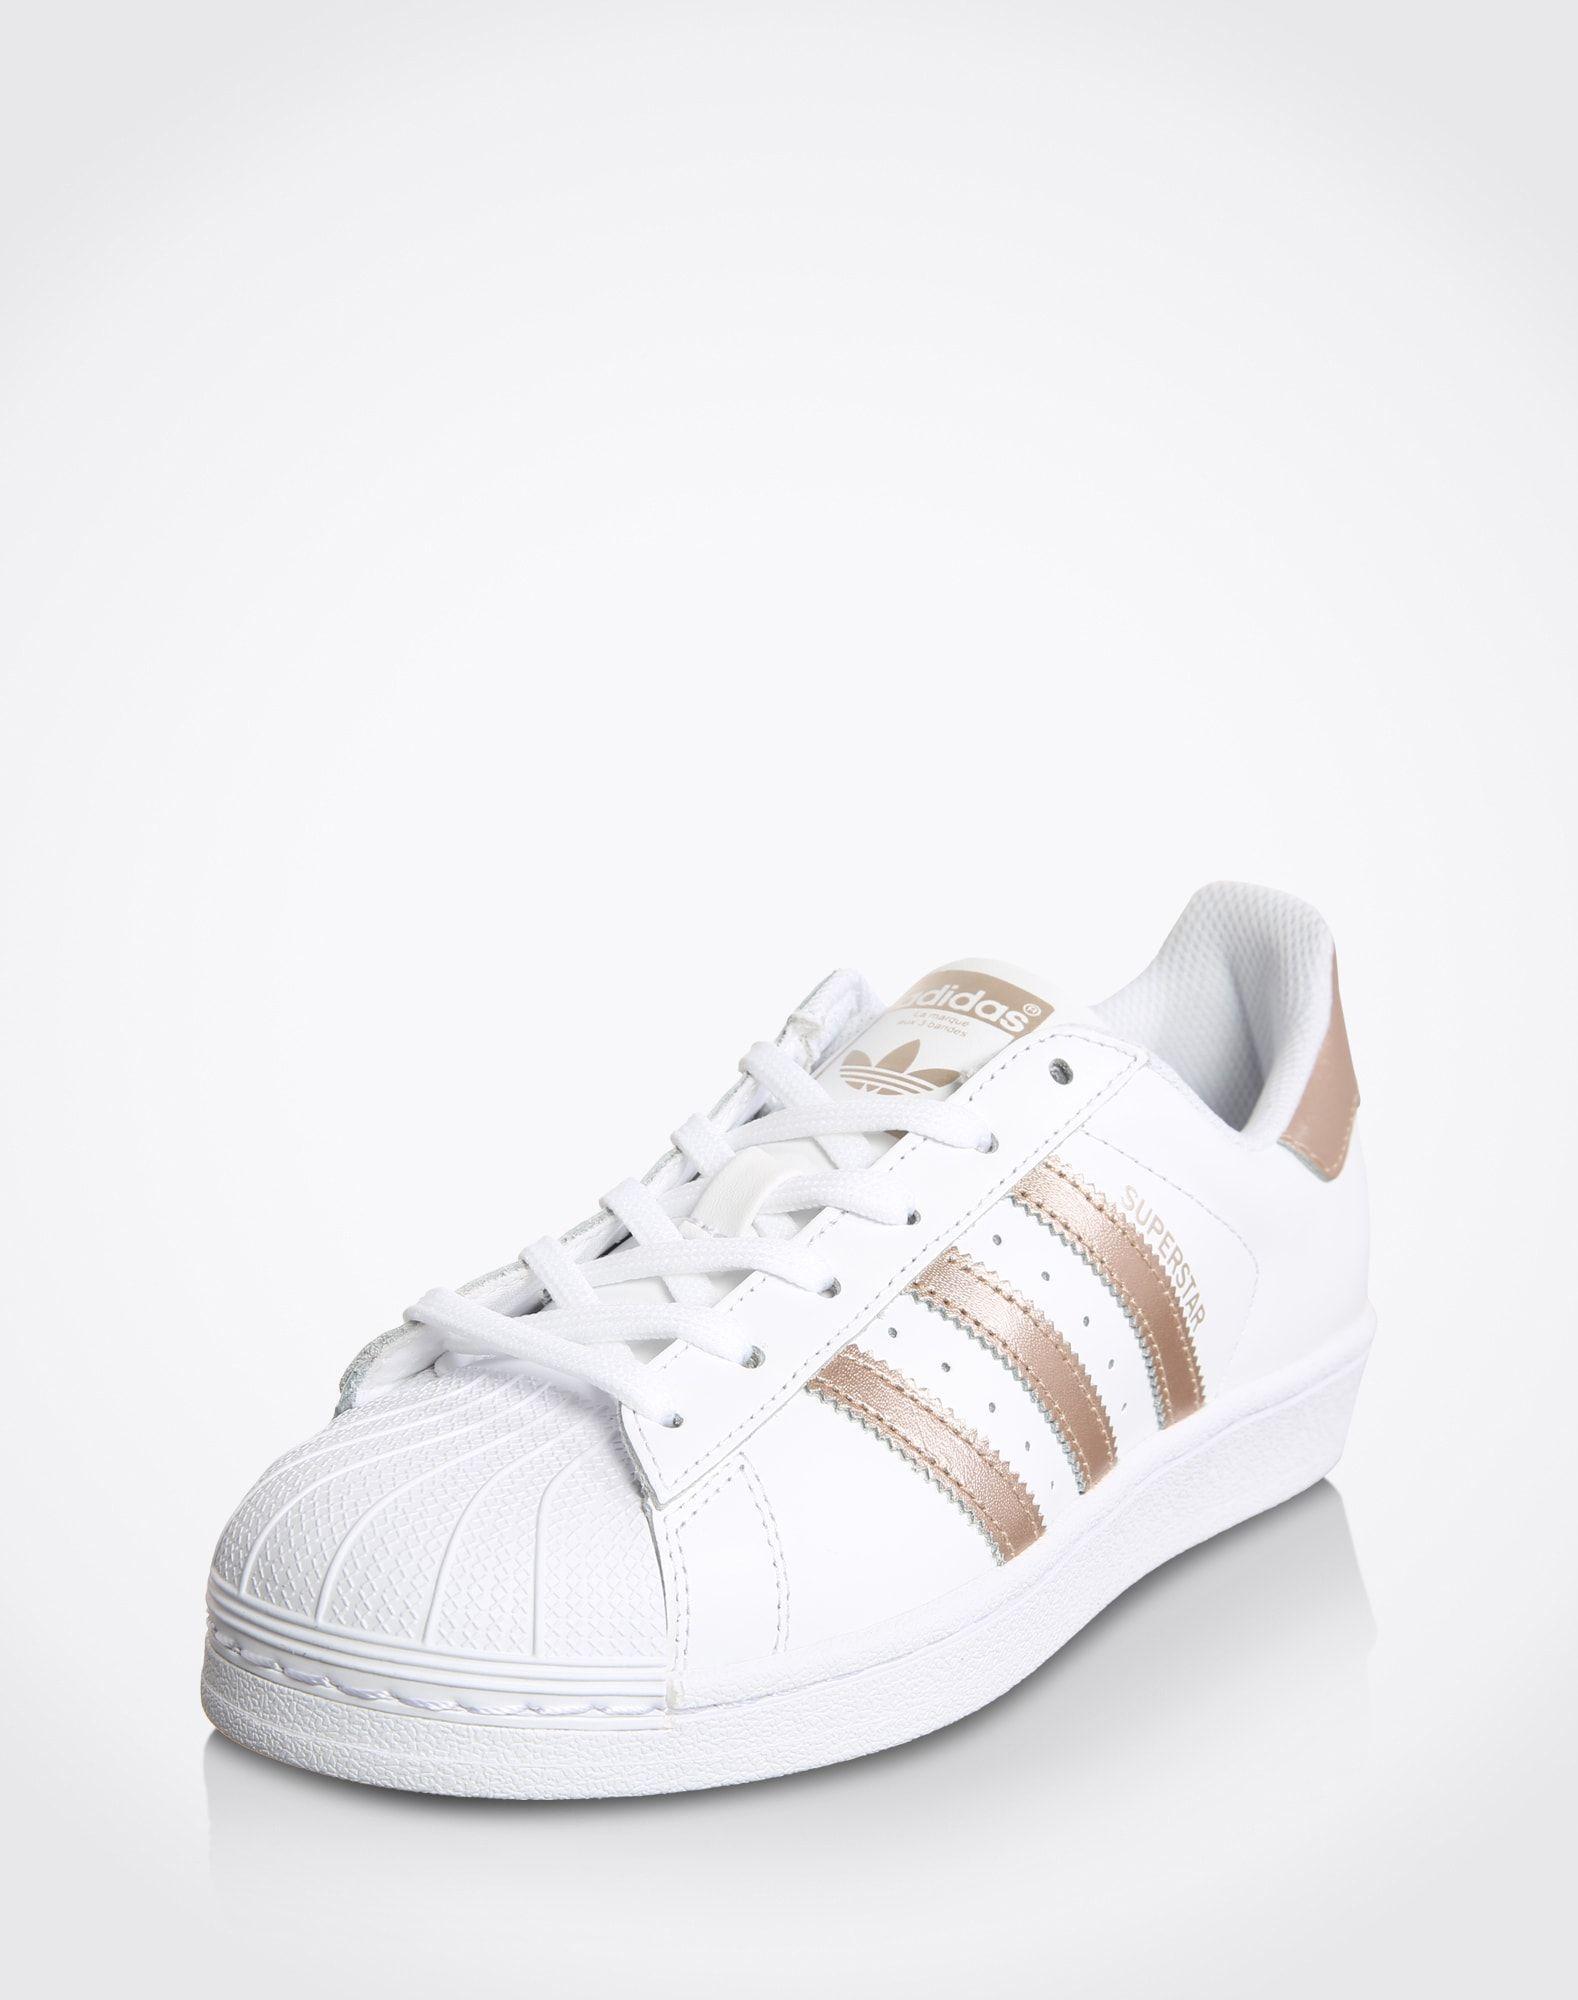 ADIDAS ORIGINALS Sneaker 'Superstar' Damen, Weiß / Gold ...